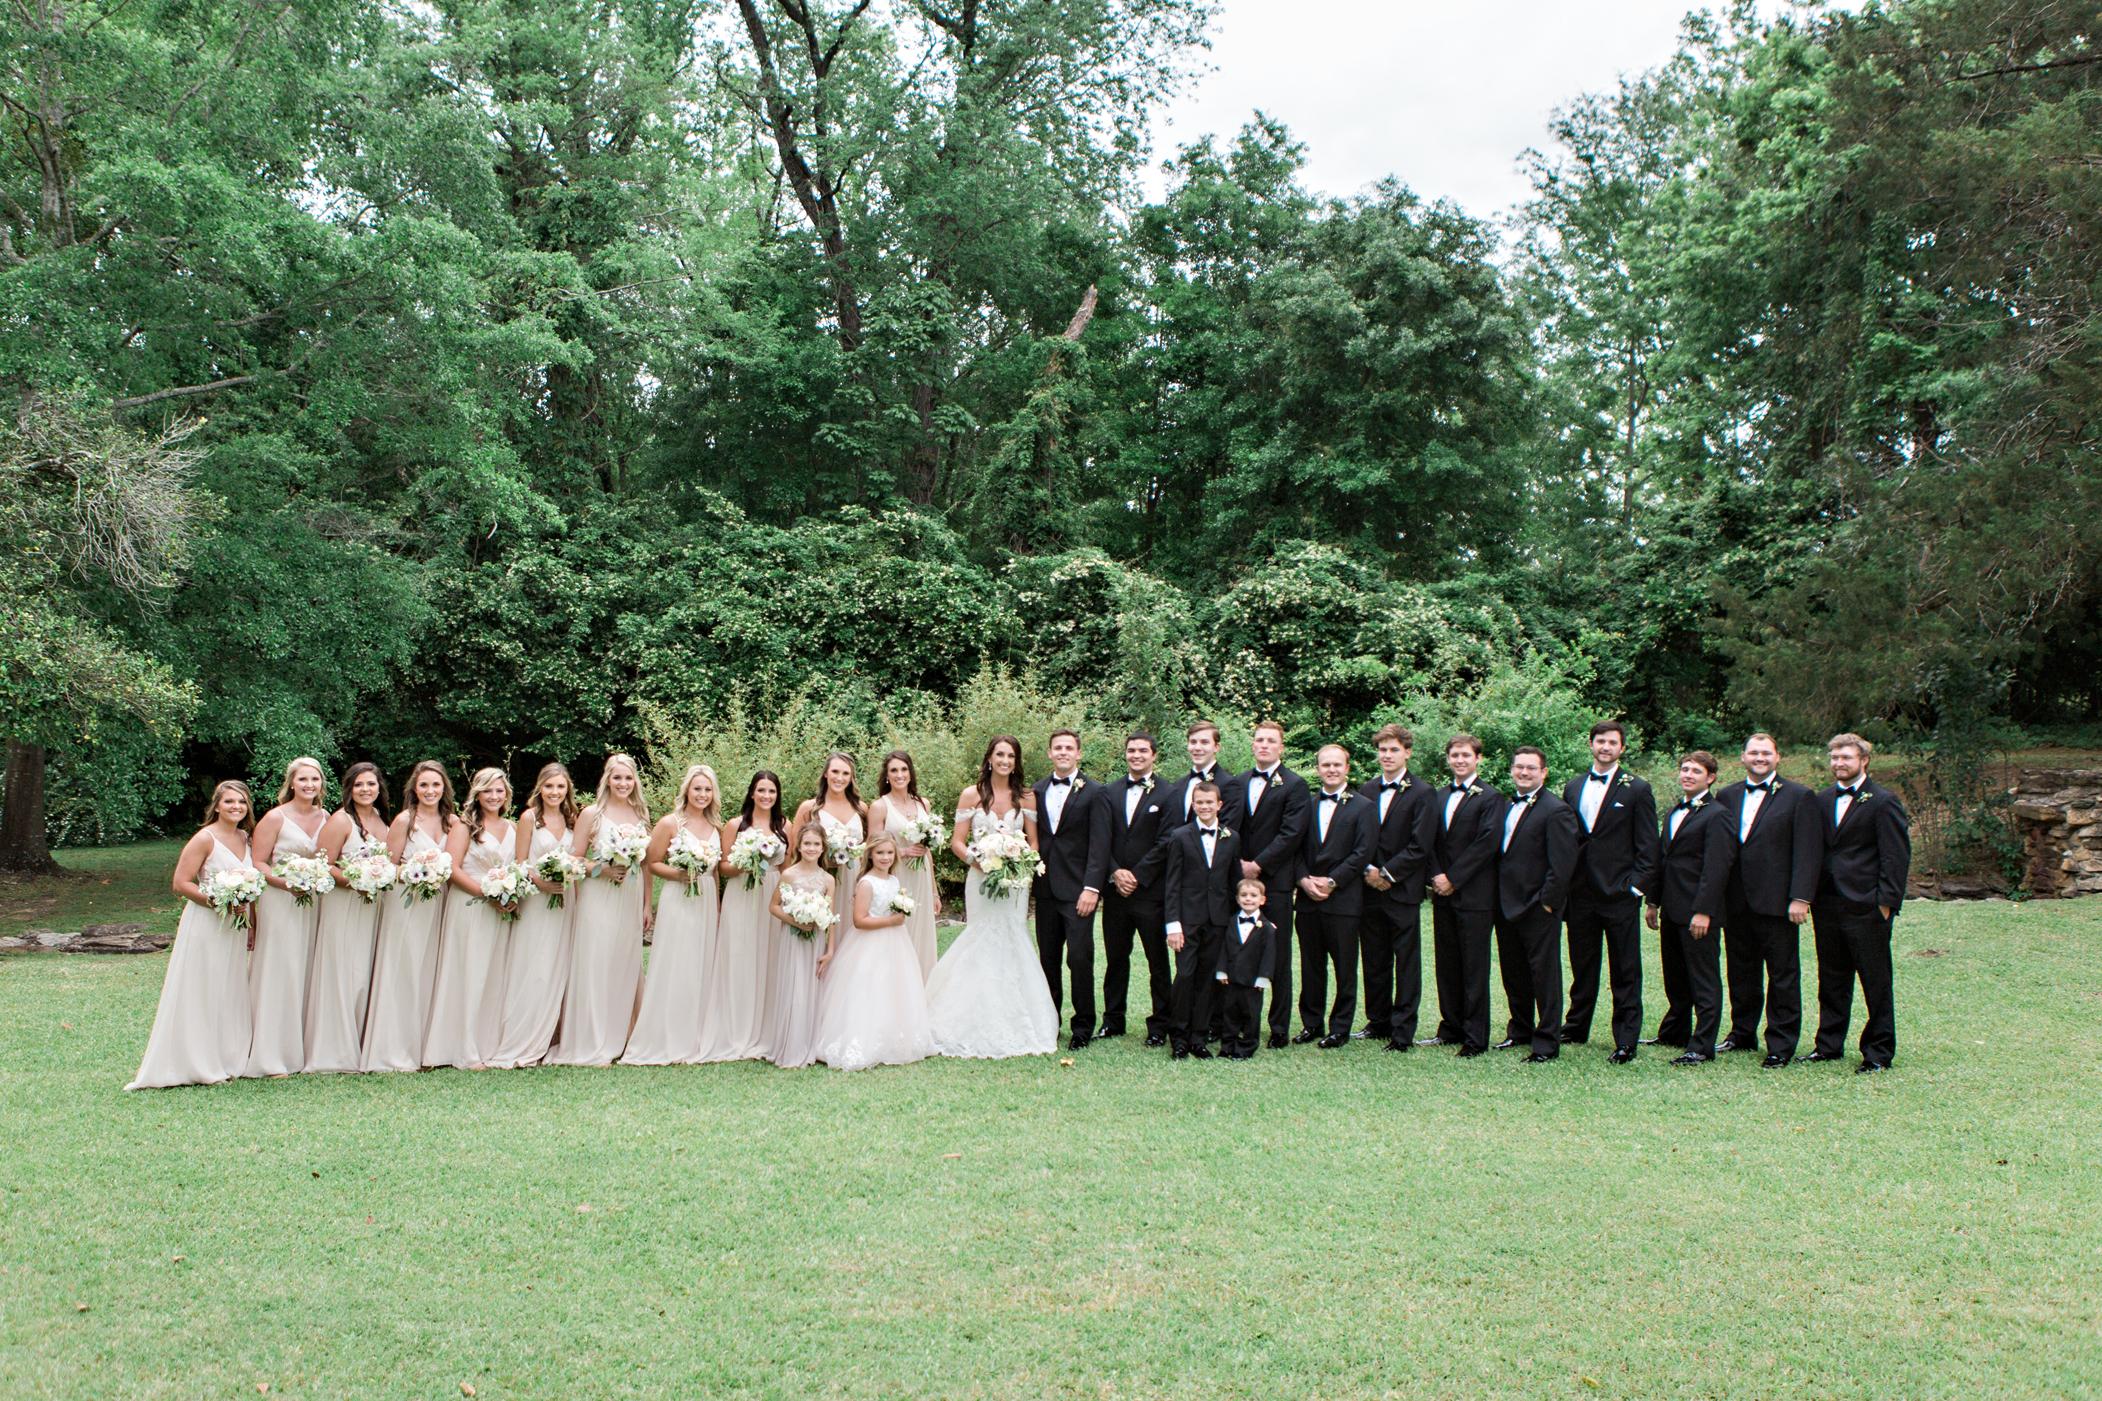 Matty-Drollette-Montgomery-Alabama-Wedding-Photography-136.jpg